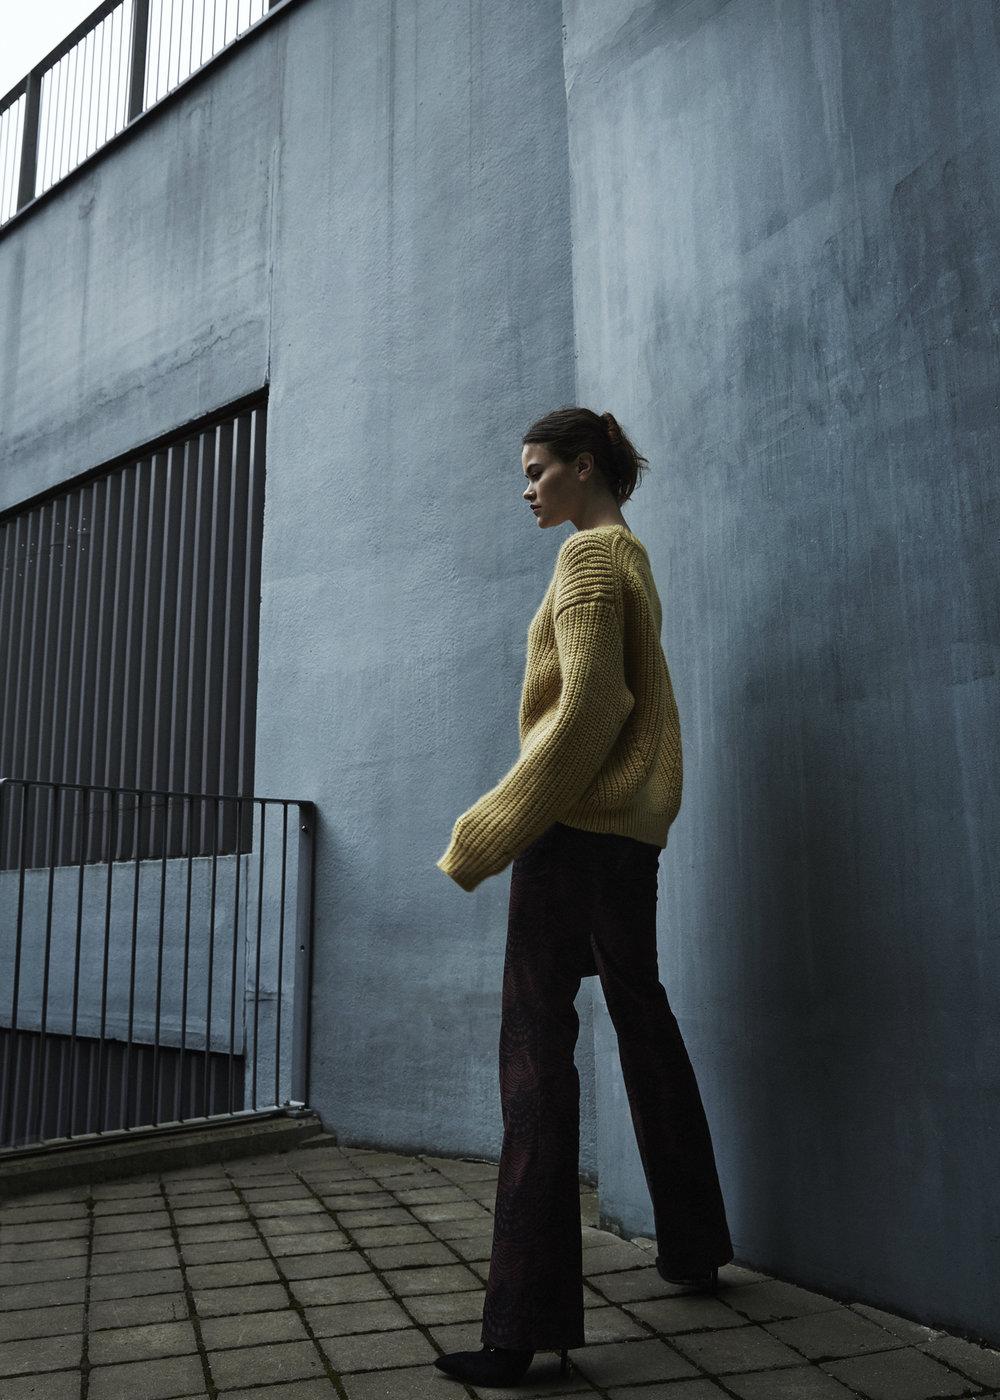 sweater ACNE STUDIOS, pants BAUM UND PFERDGARTEN, bag TIGER OF SWEDEN, shoes MAI PIU SENZA